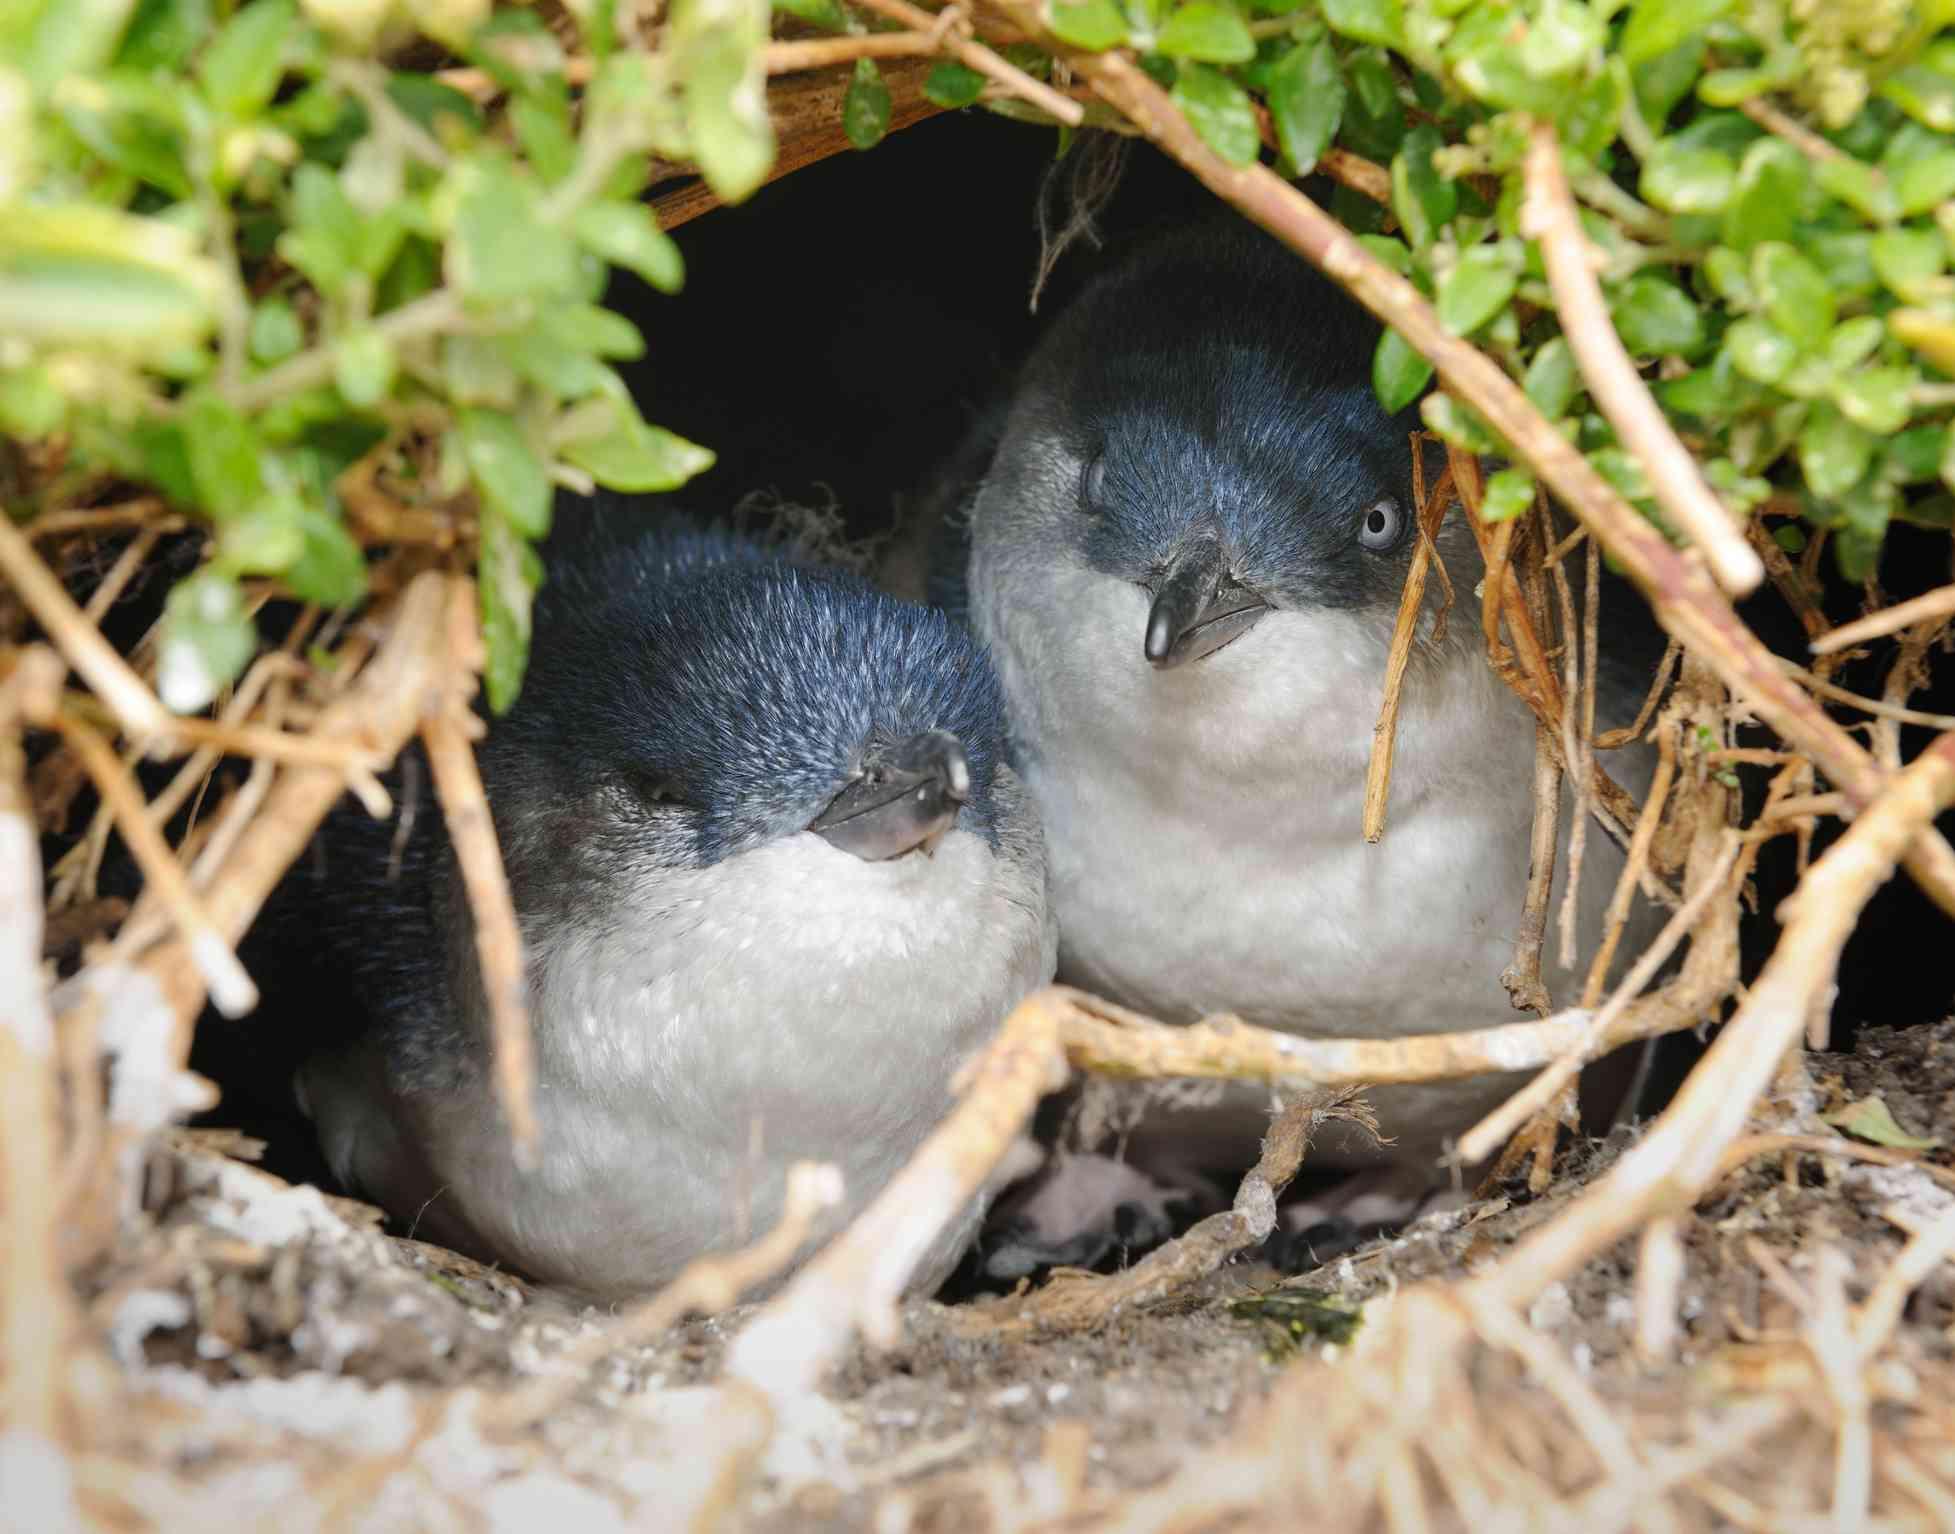 Little Penguins/Fairy Penguins (Eudyptula Minor) breeding in Wildlife, Australia